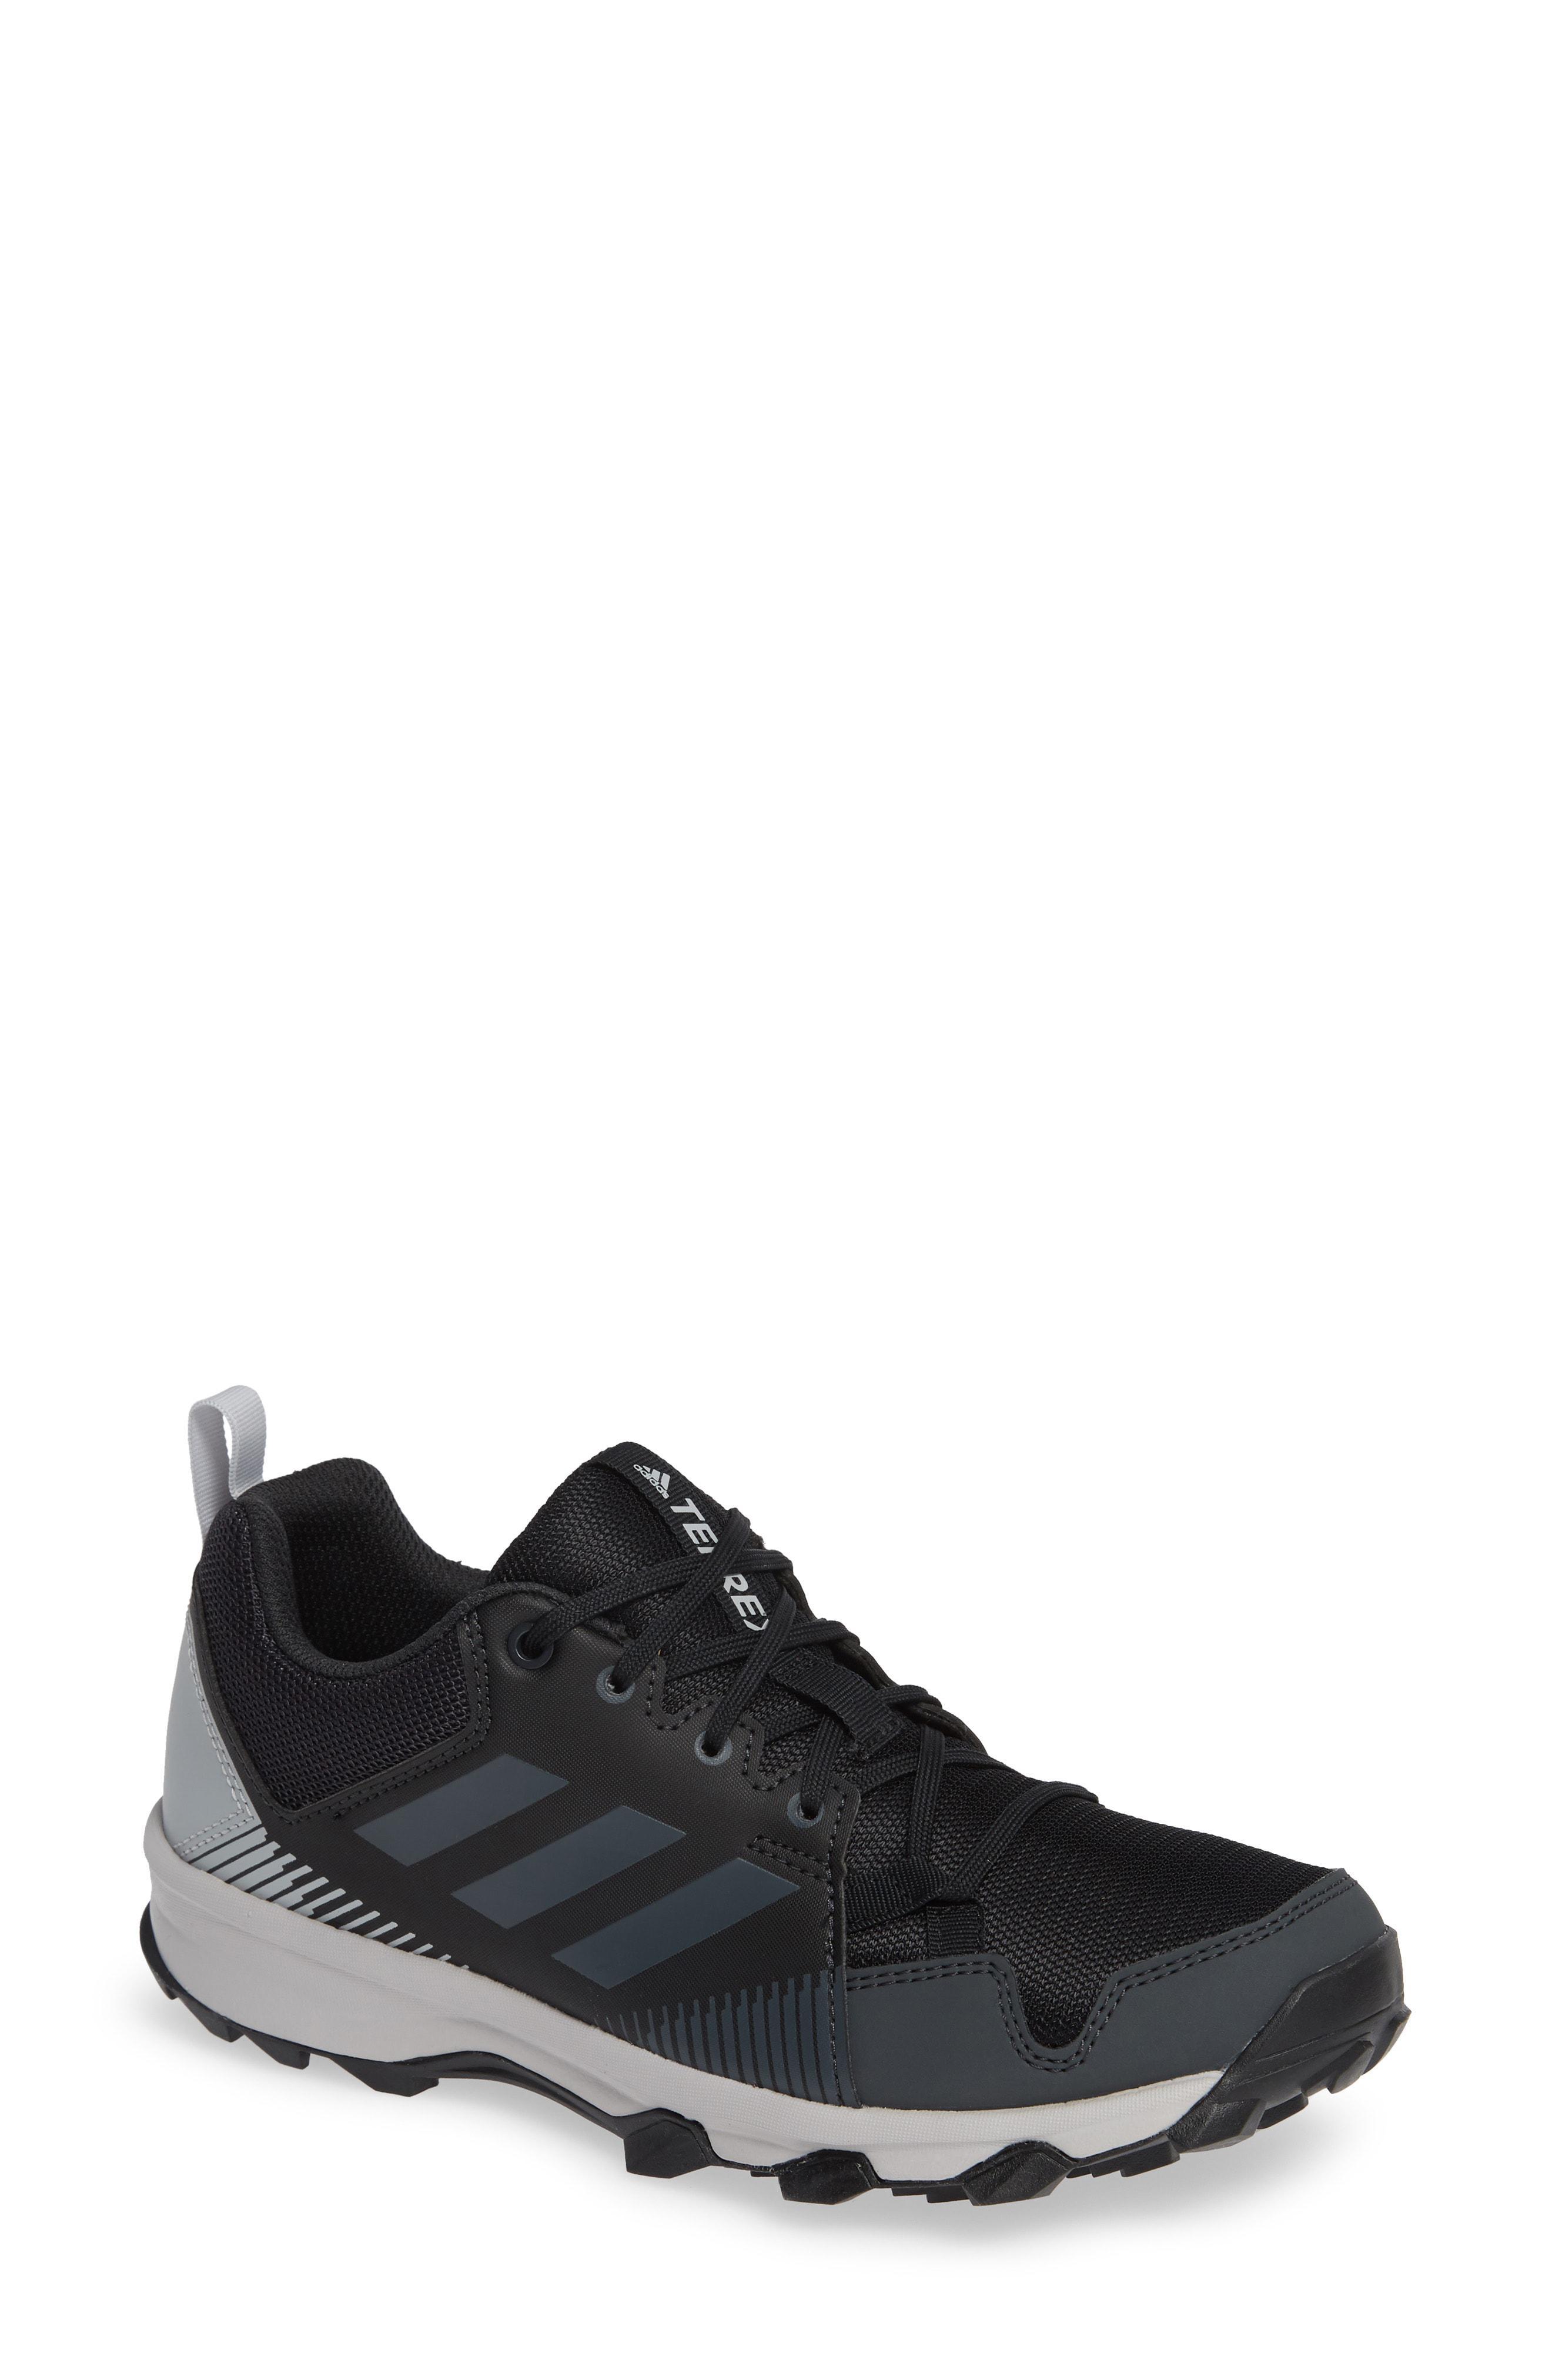 uk availability 1d63d 32e54 adidas. Womens Black Terrex Tracerocker Trail Running Shoe